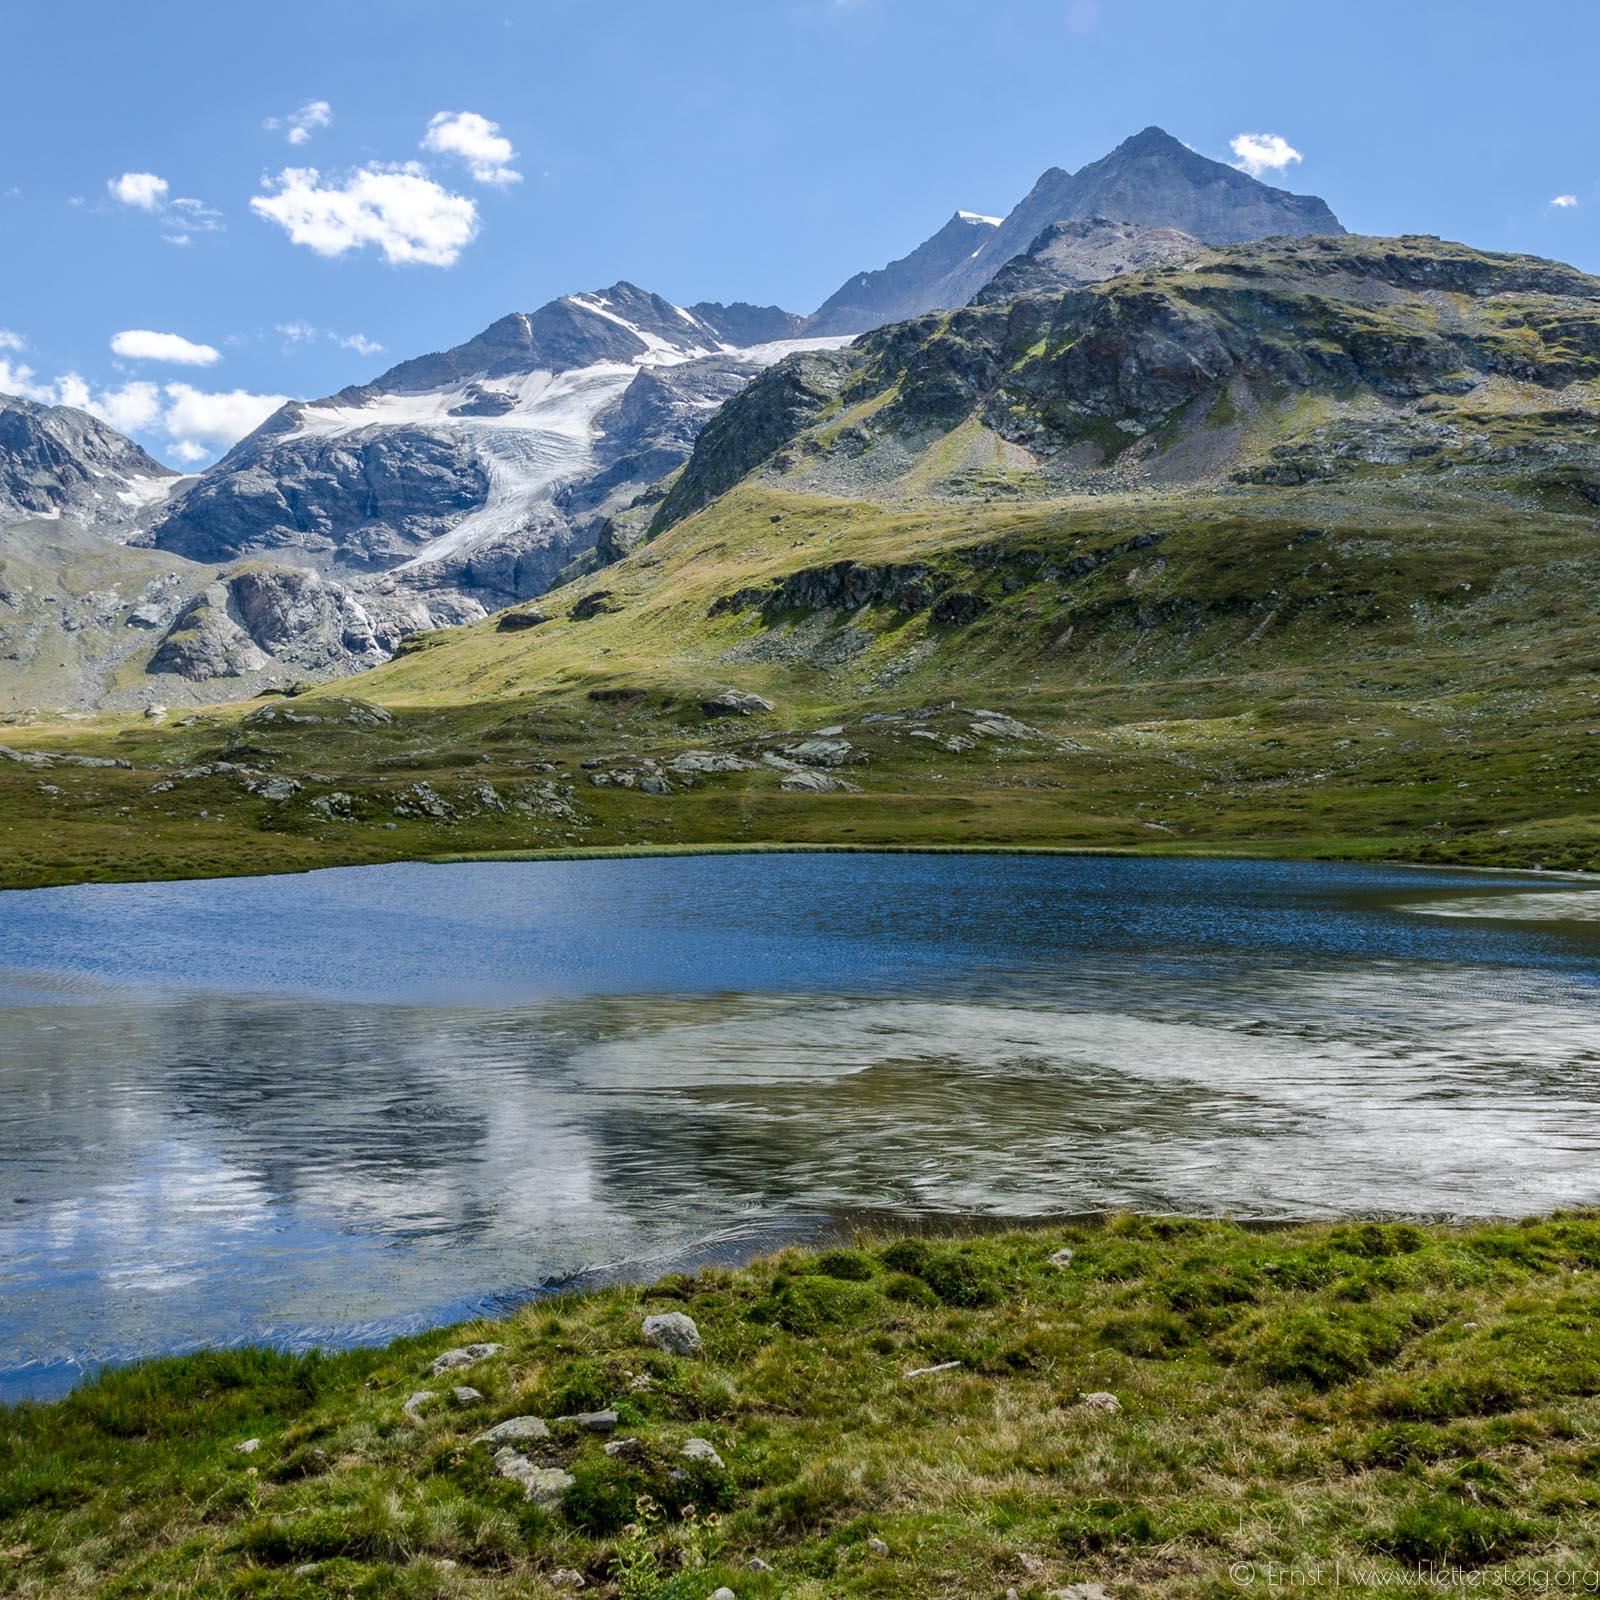 Umgebung Piz Trovat Klettersteig 2012